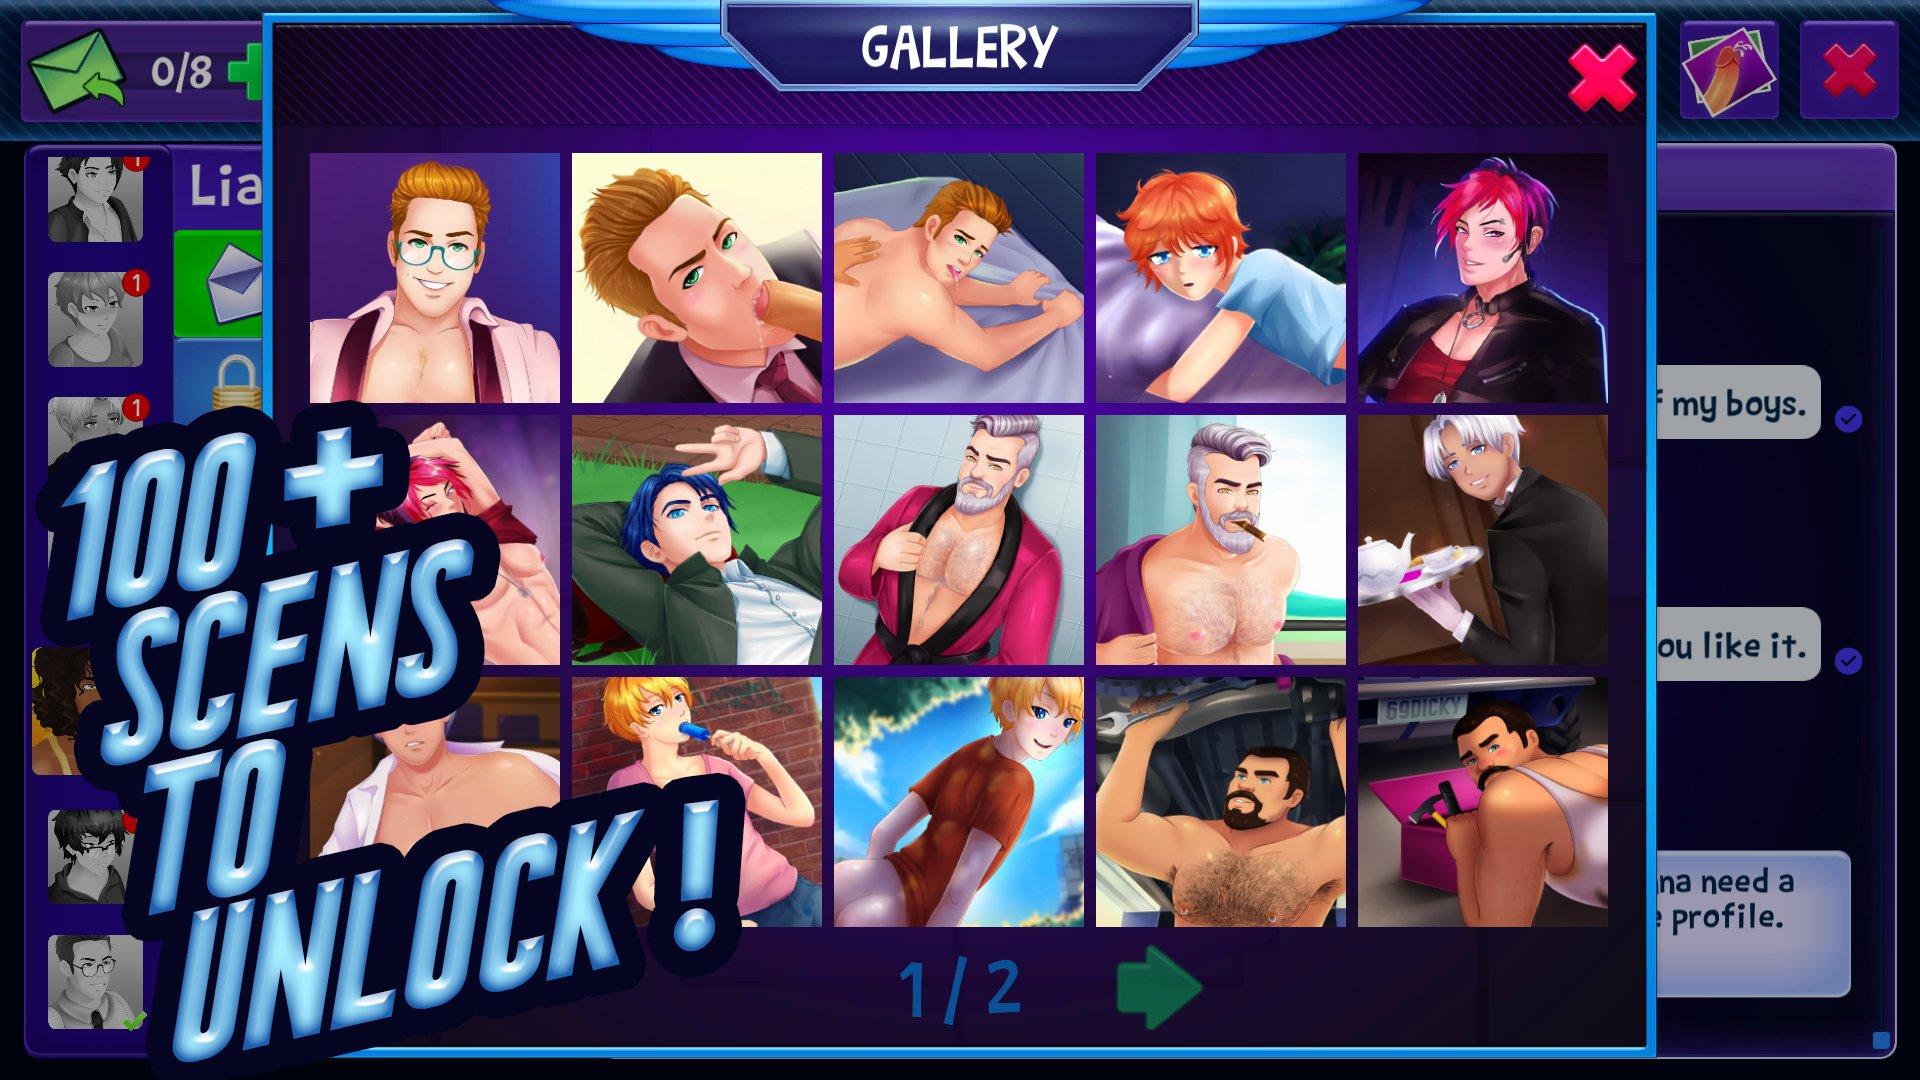 100+ scenes to unlock in Fap CEO gay sex game